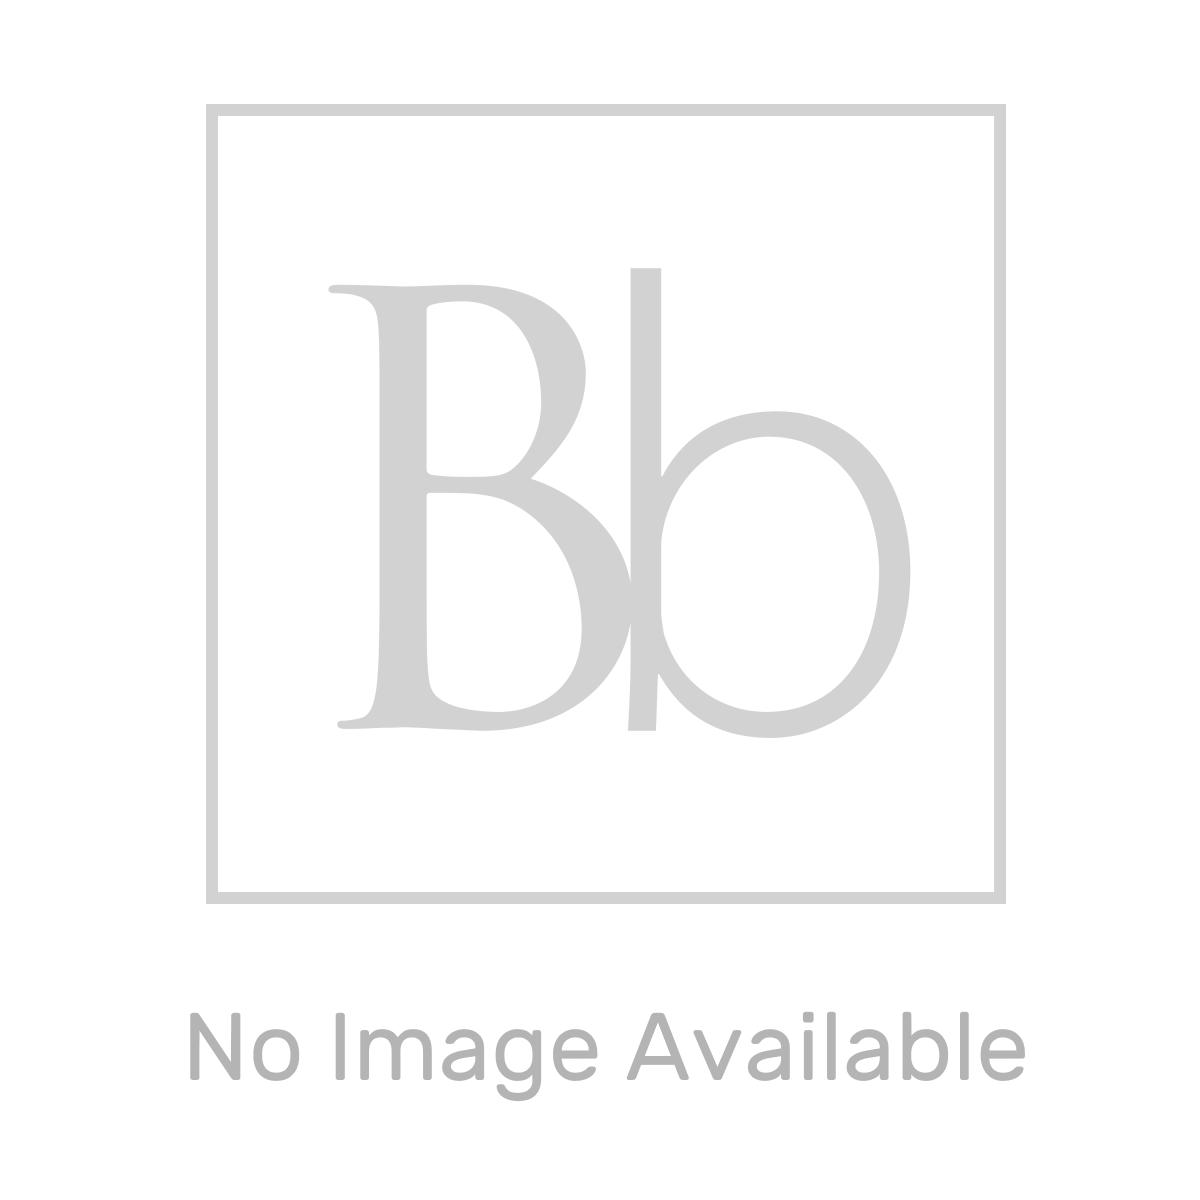 Aquadart Shower Waste with Chrome Square Grate